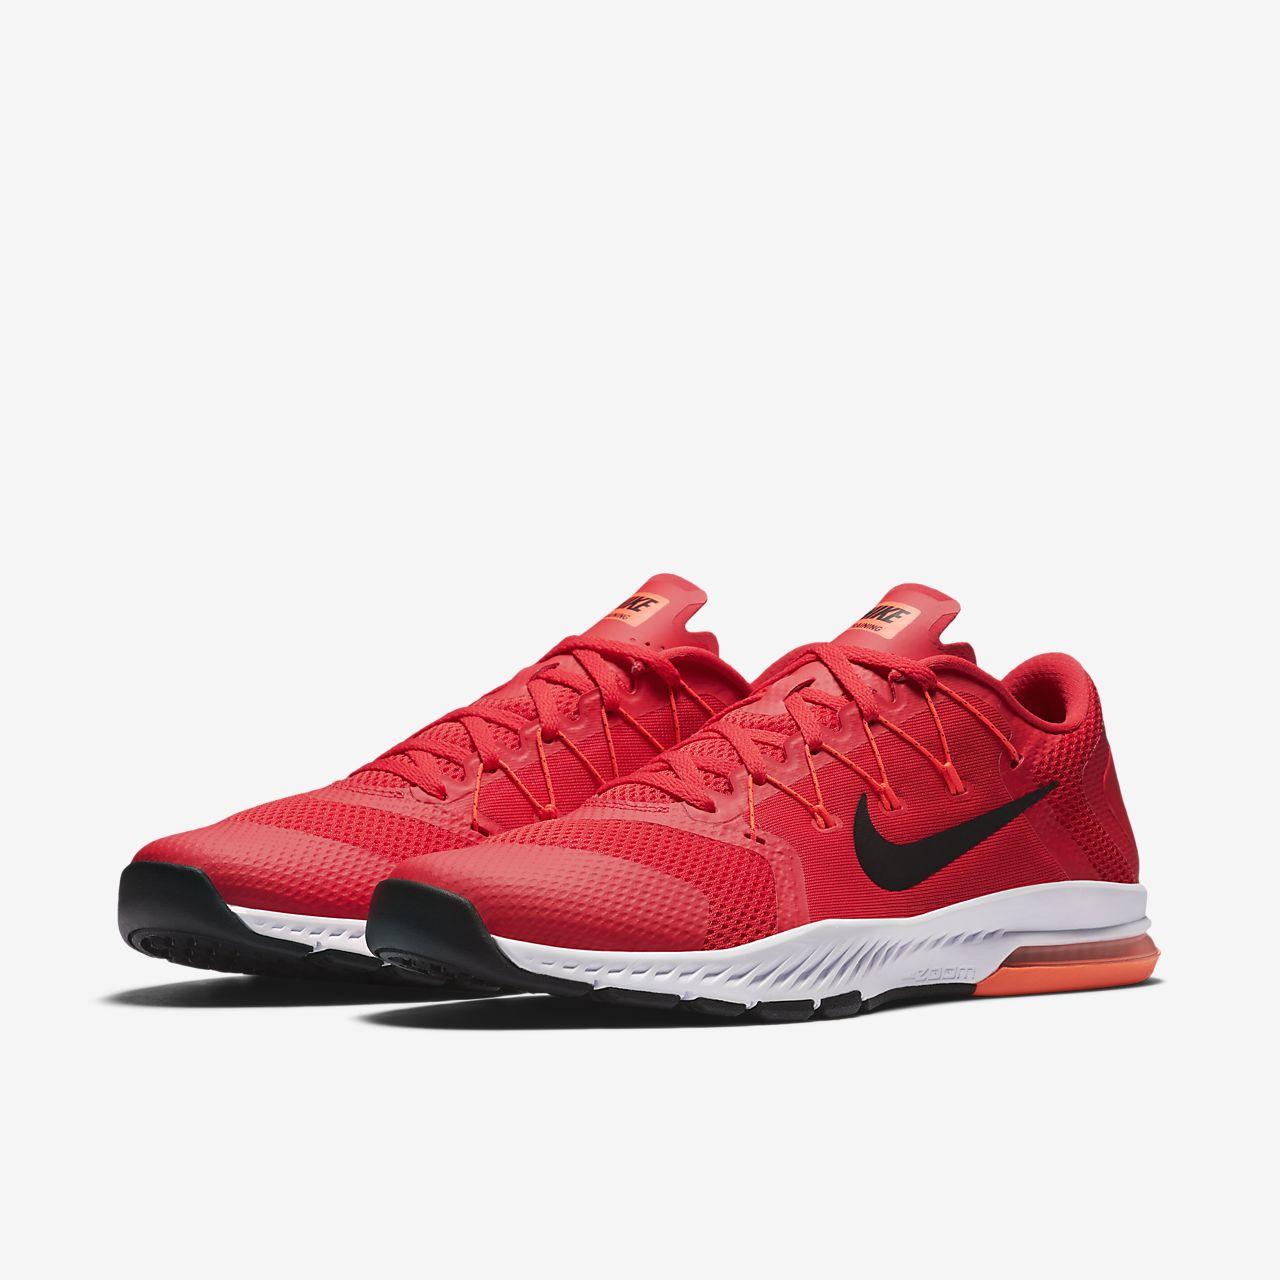 ... Nike Zoom Train Complete Men's Training Shoe